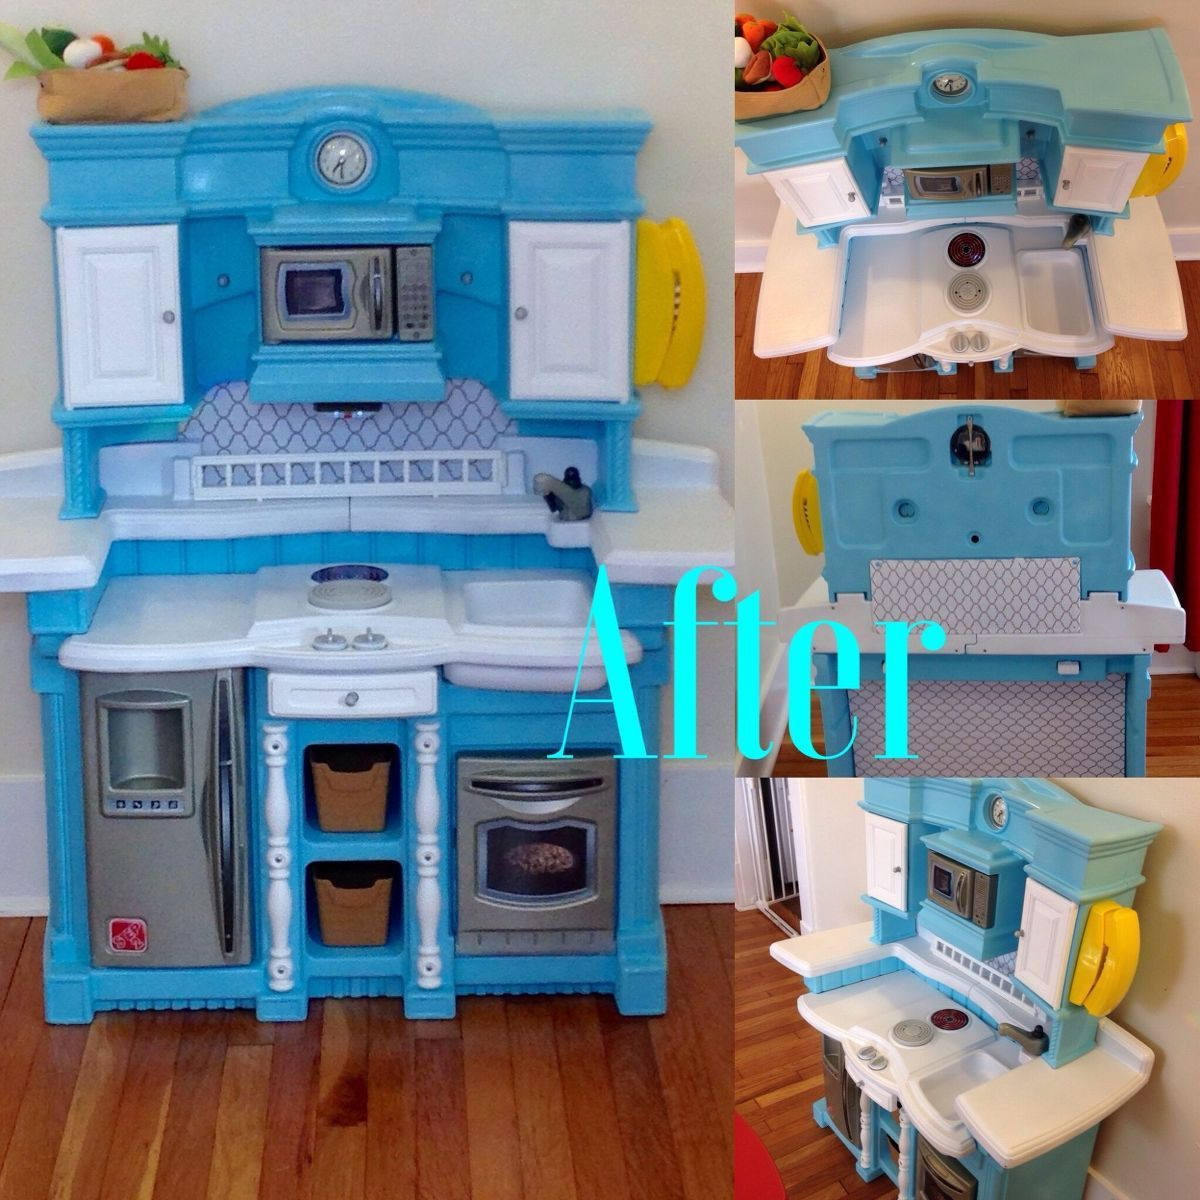 Upcycled Plastic Play Kitchen Play Kitchen Diy Play Kitchen Kids Play Kitchen